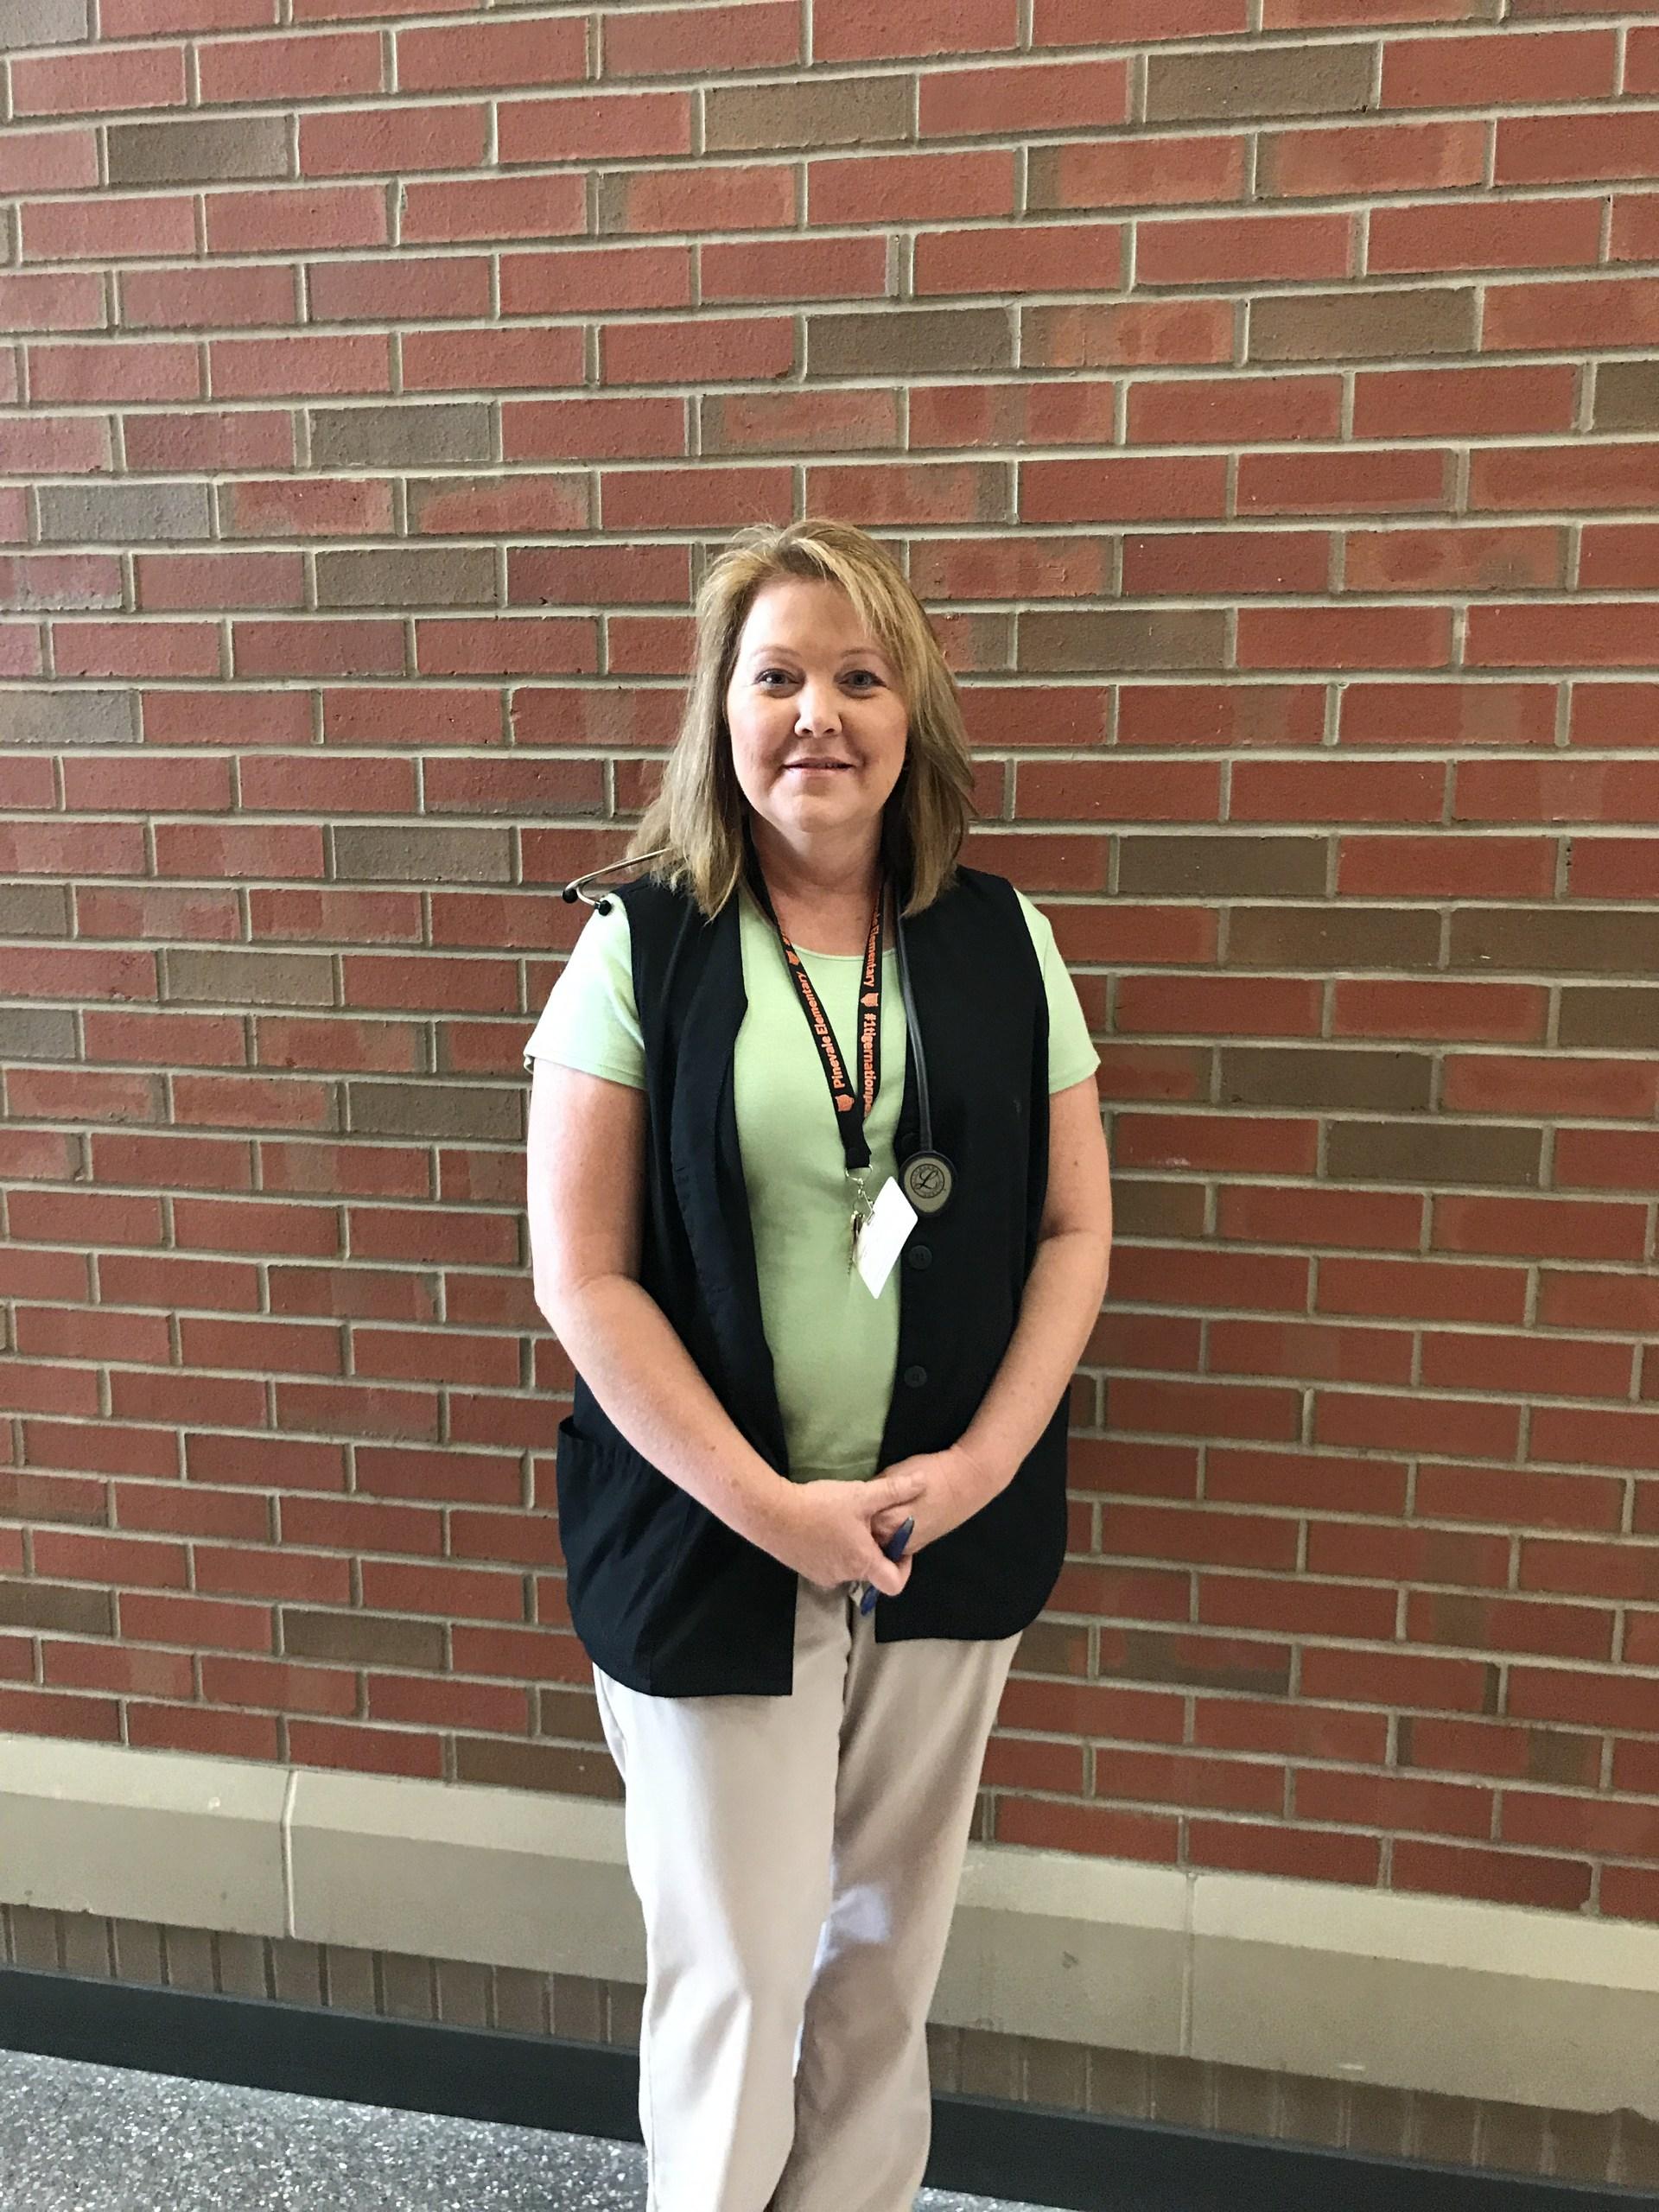 Mrs. Jennifer Garrett, Registered Nurse and School Nurse